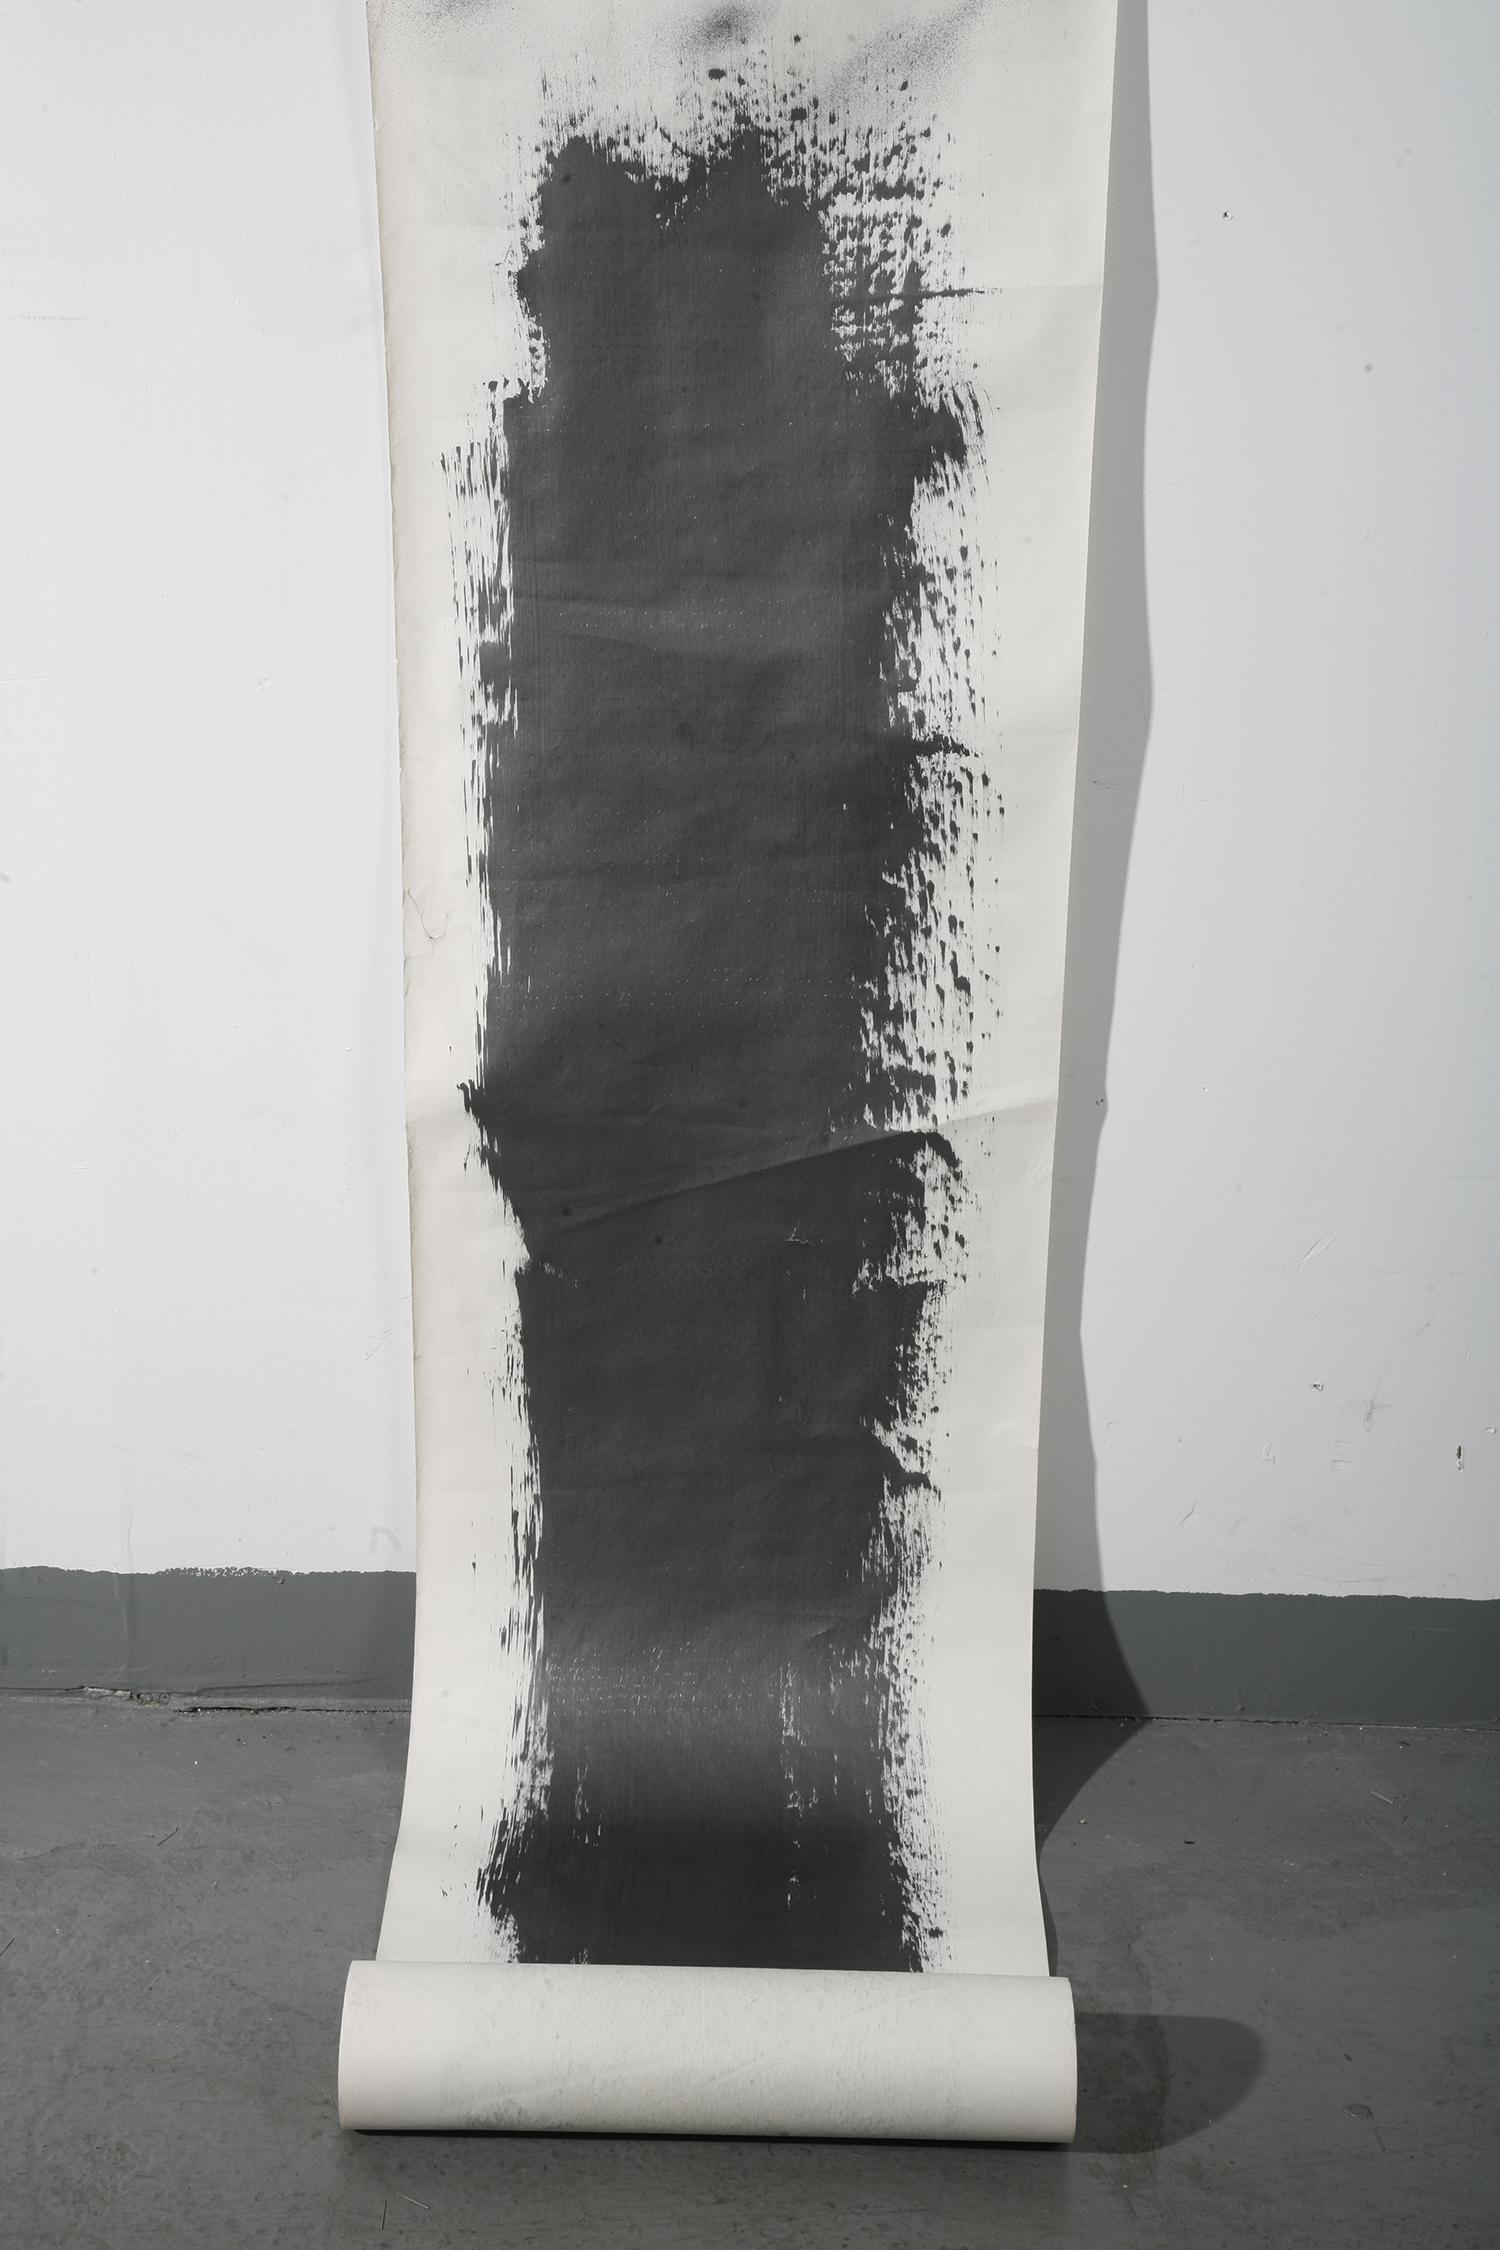 """SWEETCAKE ENSO,"" TRAVELLING ZENDO EXHIBITION, EMPTY HAND ZENDO, NEW ROCHELLE, NY VILLAGE ZENDO 2010"